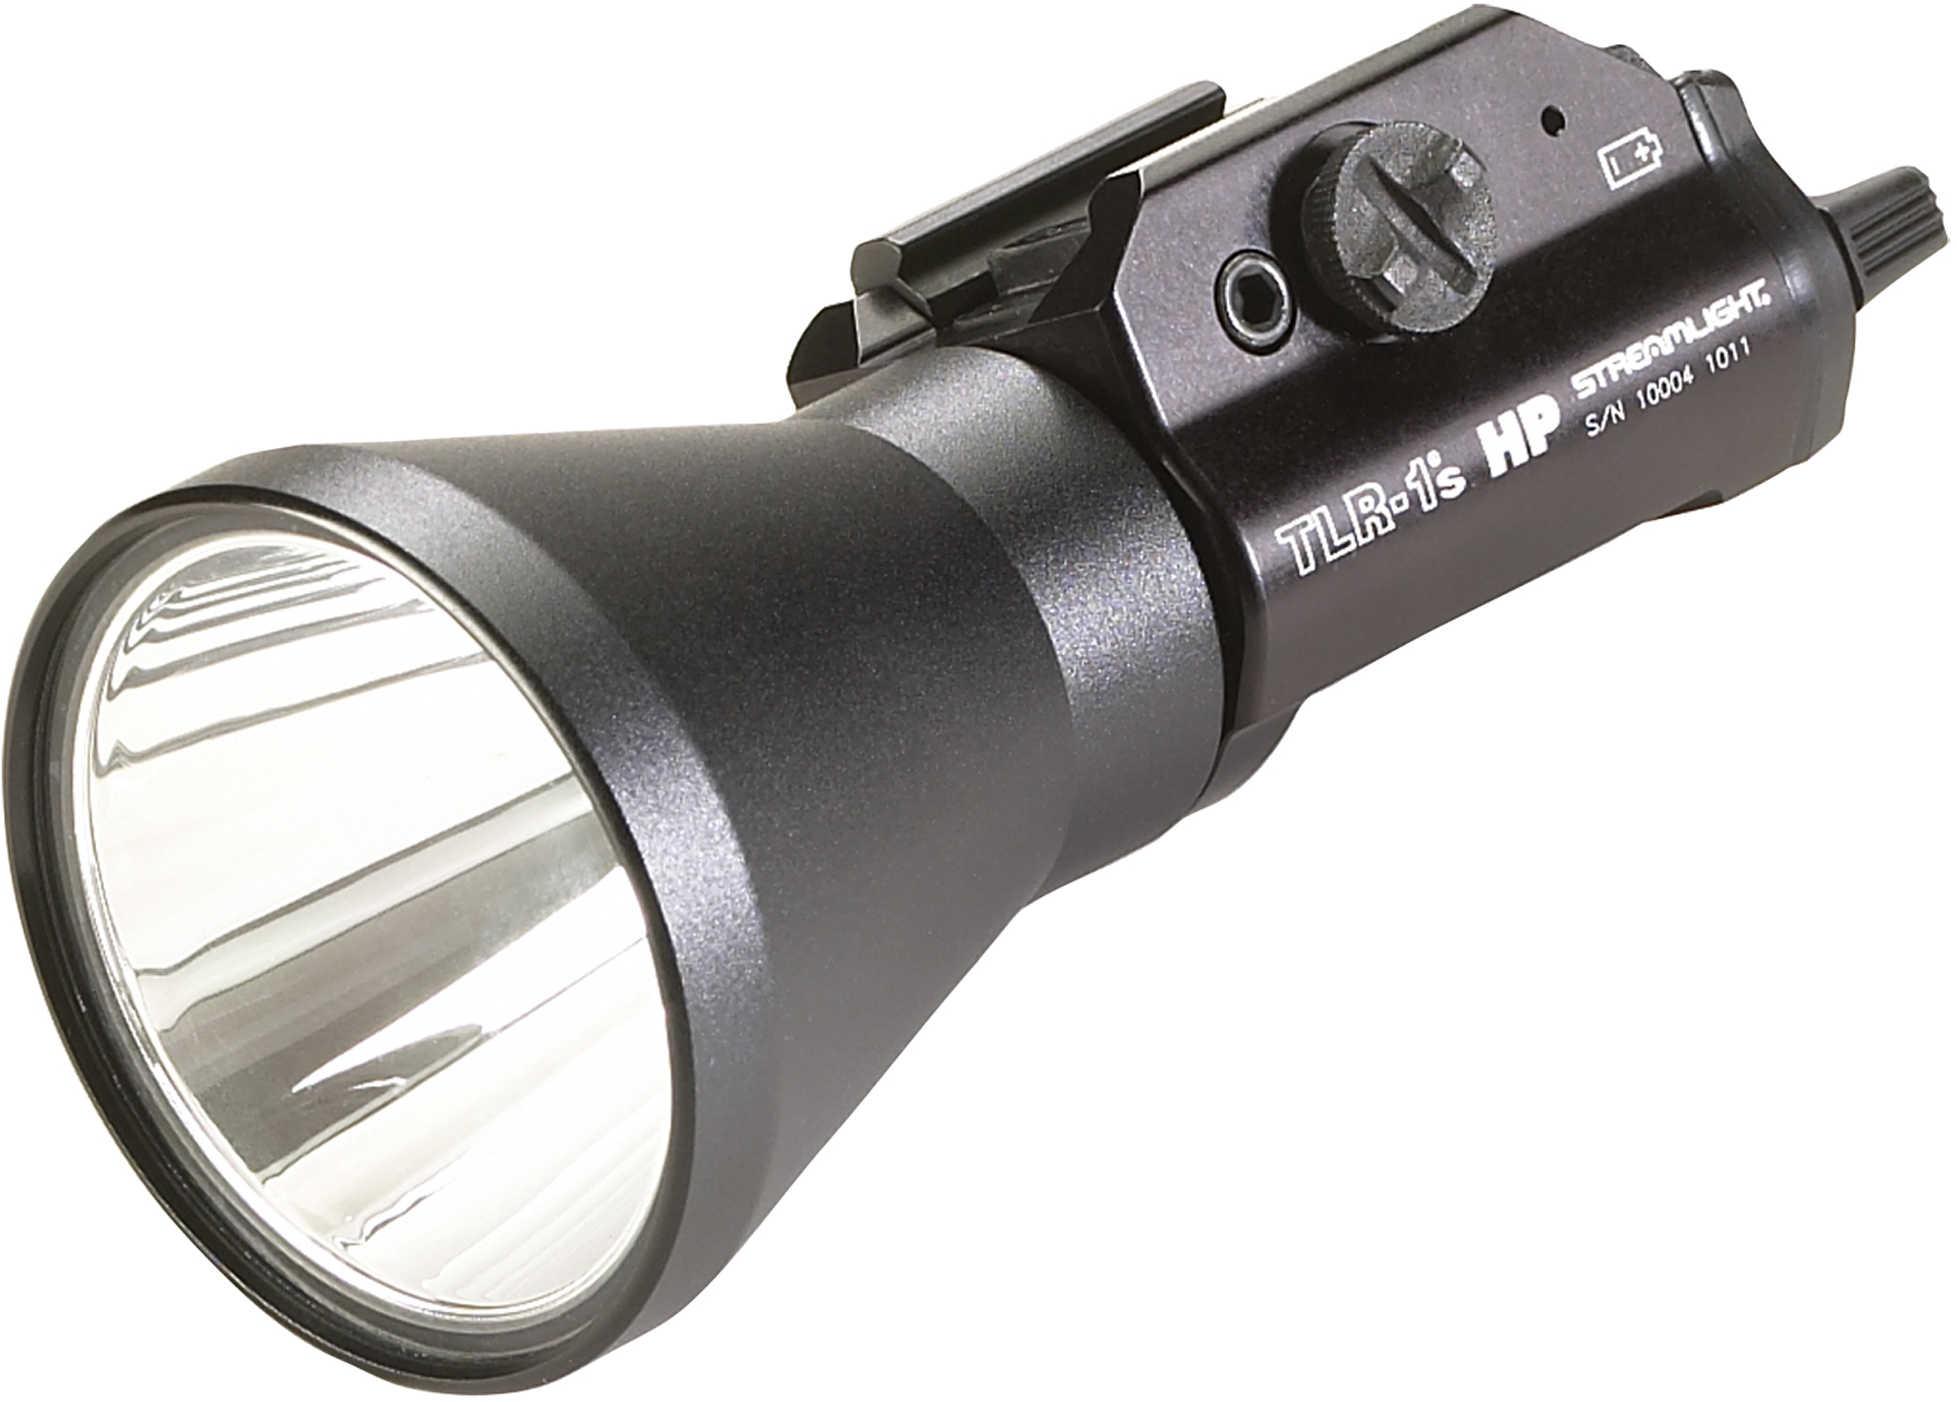 Streamlight TLR-1 HPL Tactical Light Fits Long Gun w/1913 Rails C4 LED 790 Lumens Black Finish with Batteries 69215